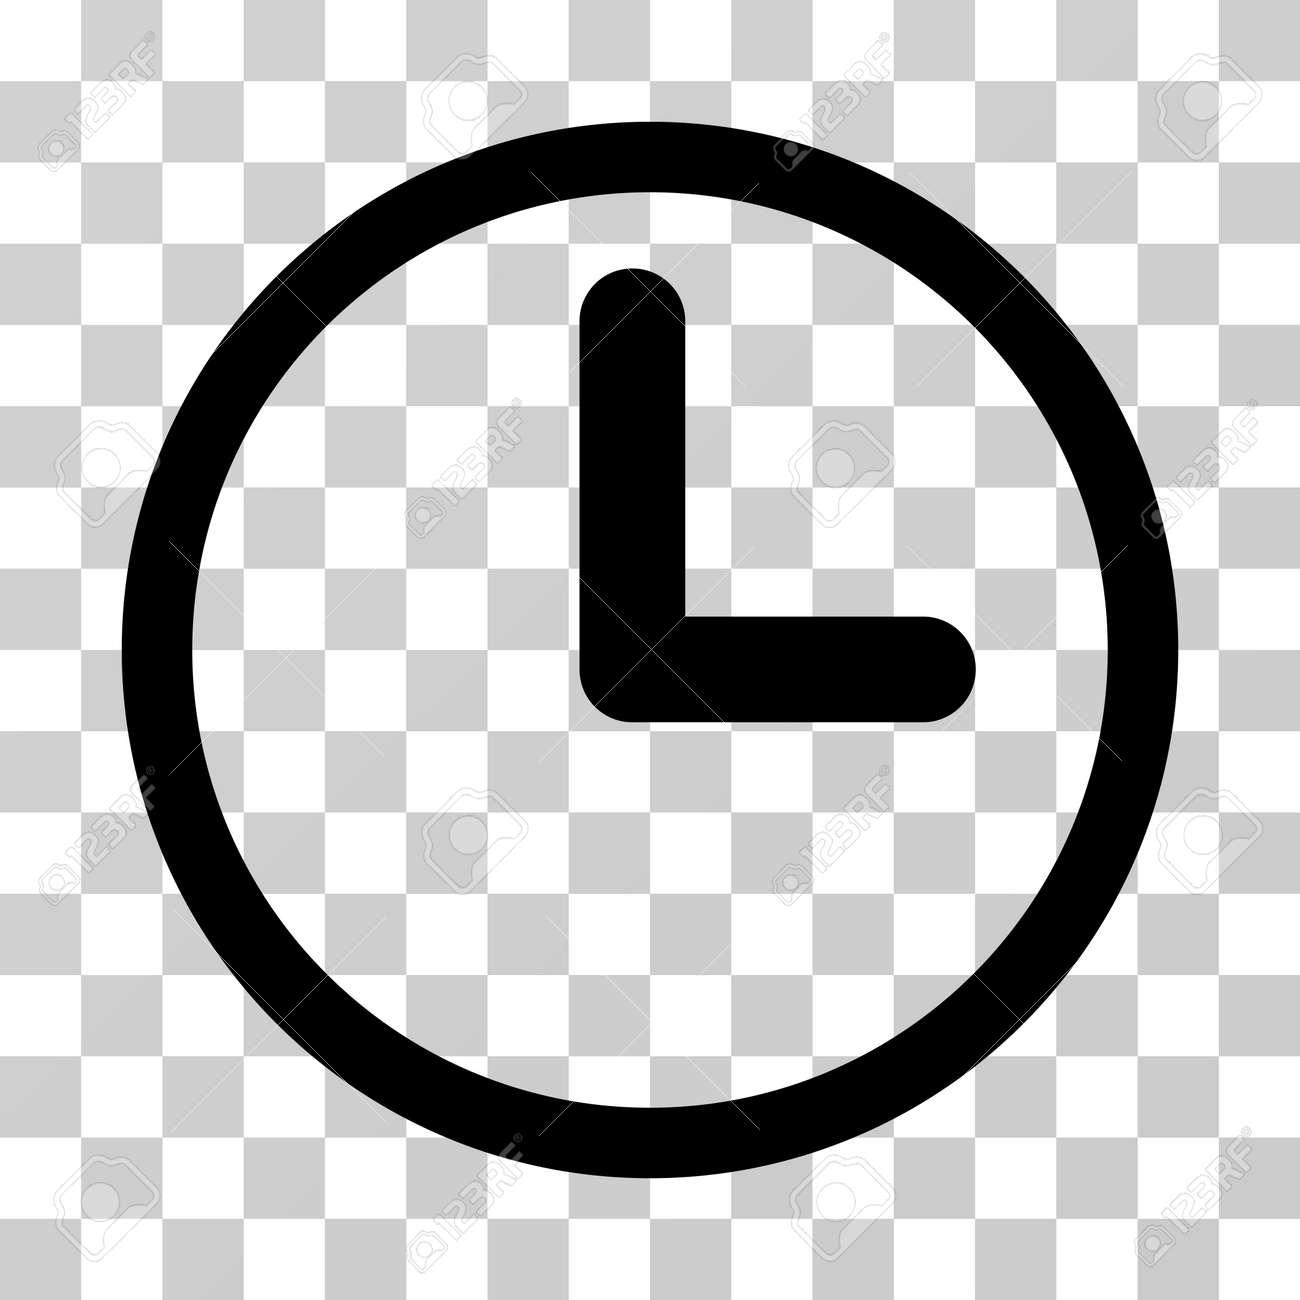 clock icon vector illustration style is flat iconic symbol rh 123rf com time clock icon vector clock icon vector free